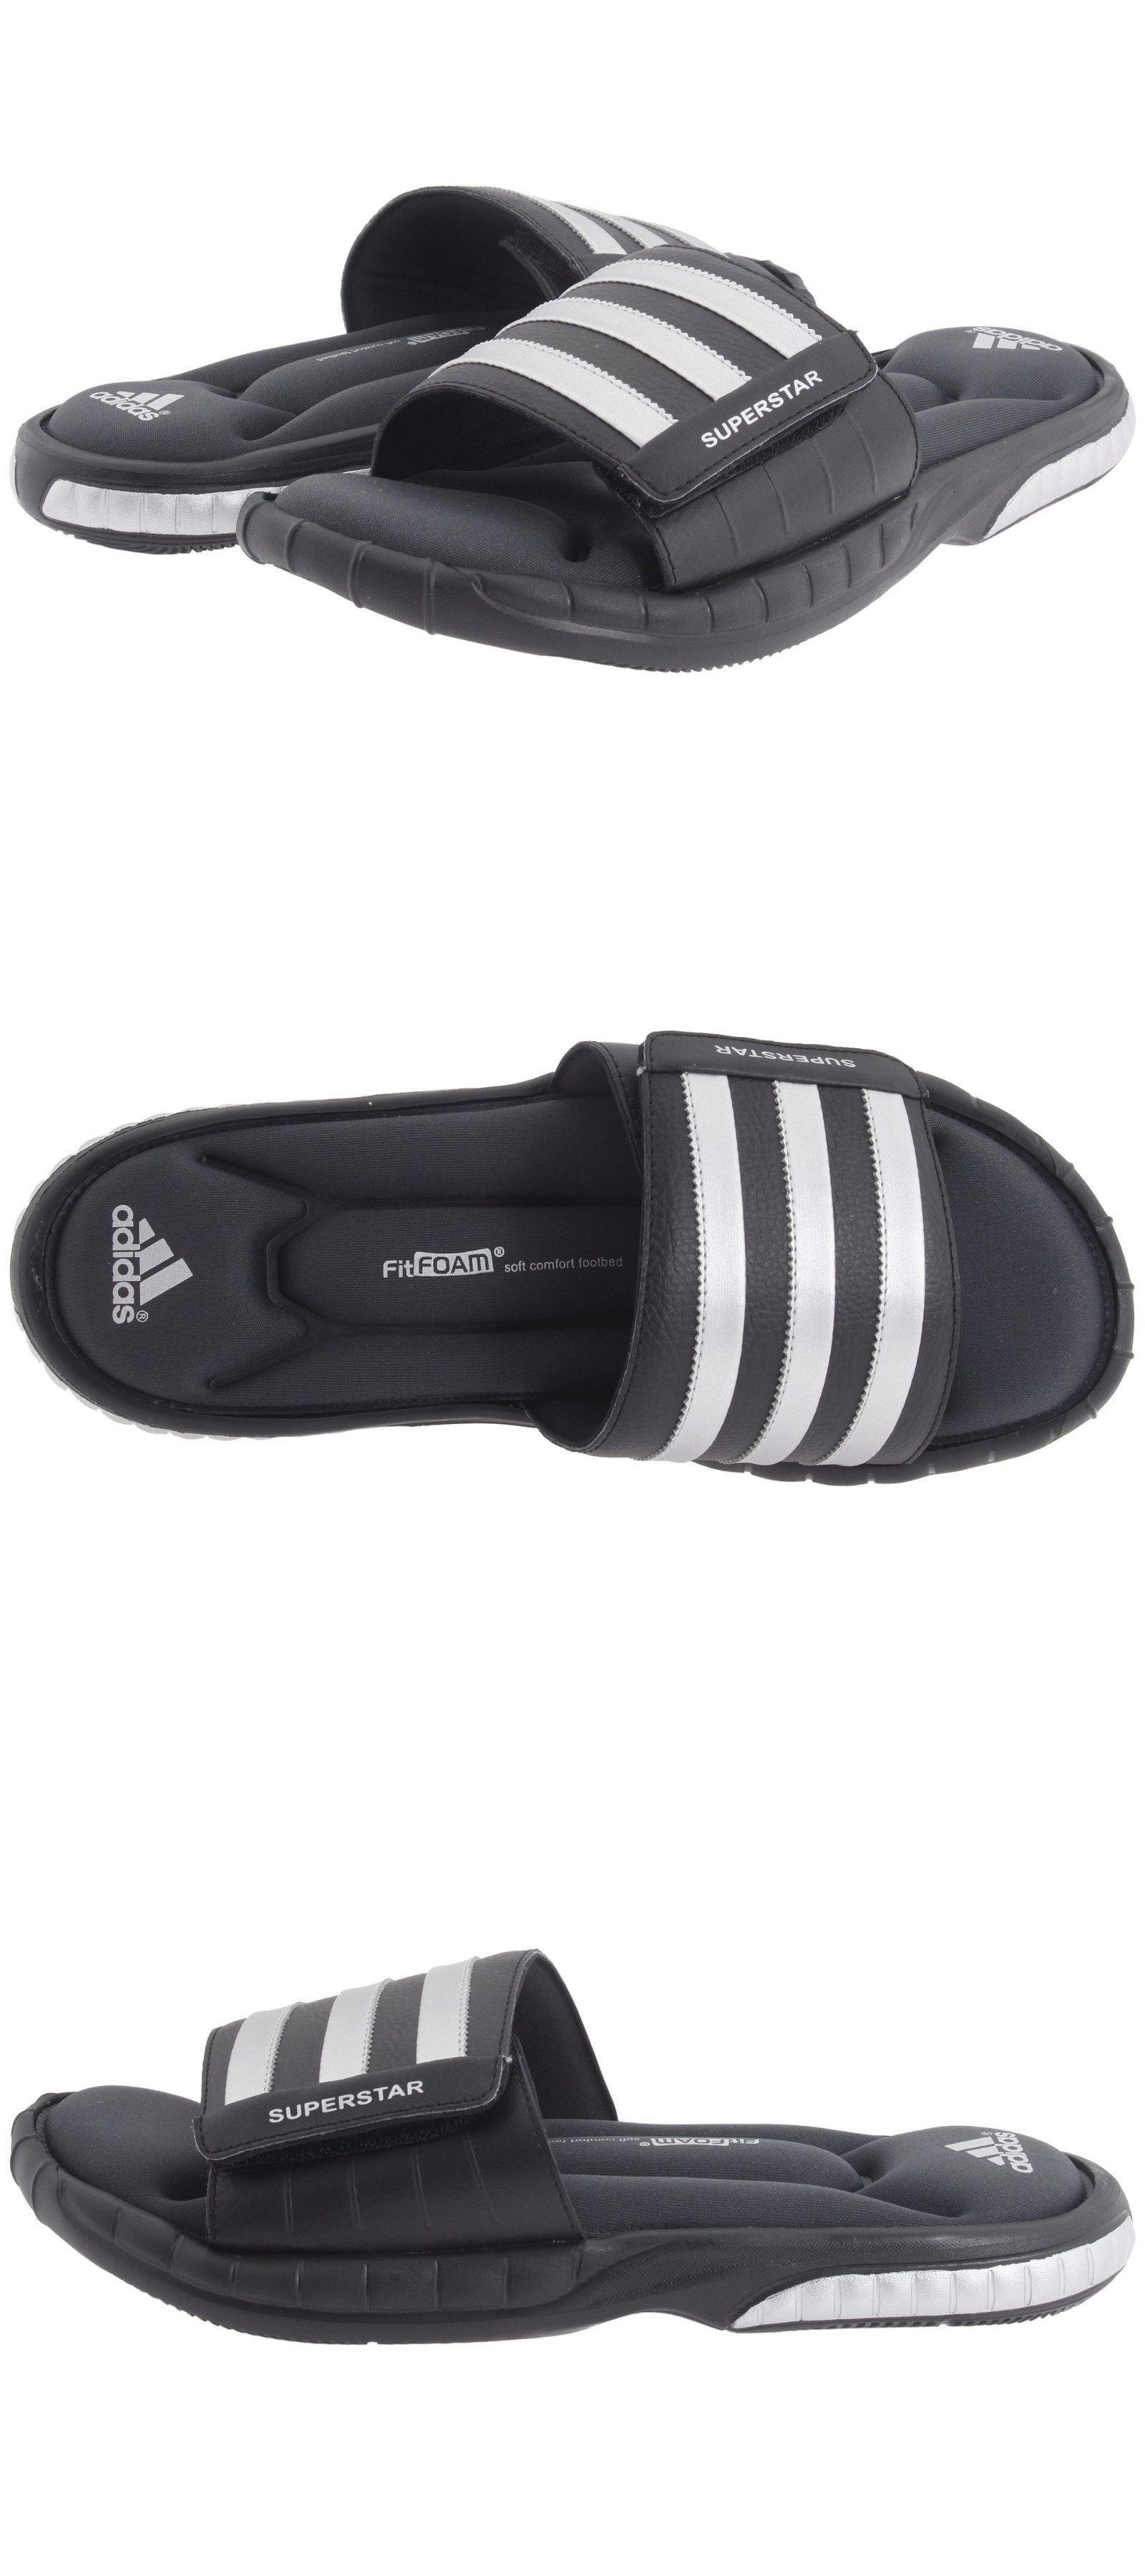 Sandals and Flip Flops 11504  Superstar Adidas 3G Black Slides Athletic  Sport Sandals G40165 Men S Sizes 7-13 -  BUY IT NOW ONLY   33 on eBay! 6f0c7d8d4